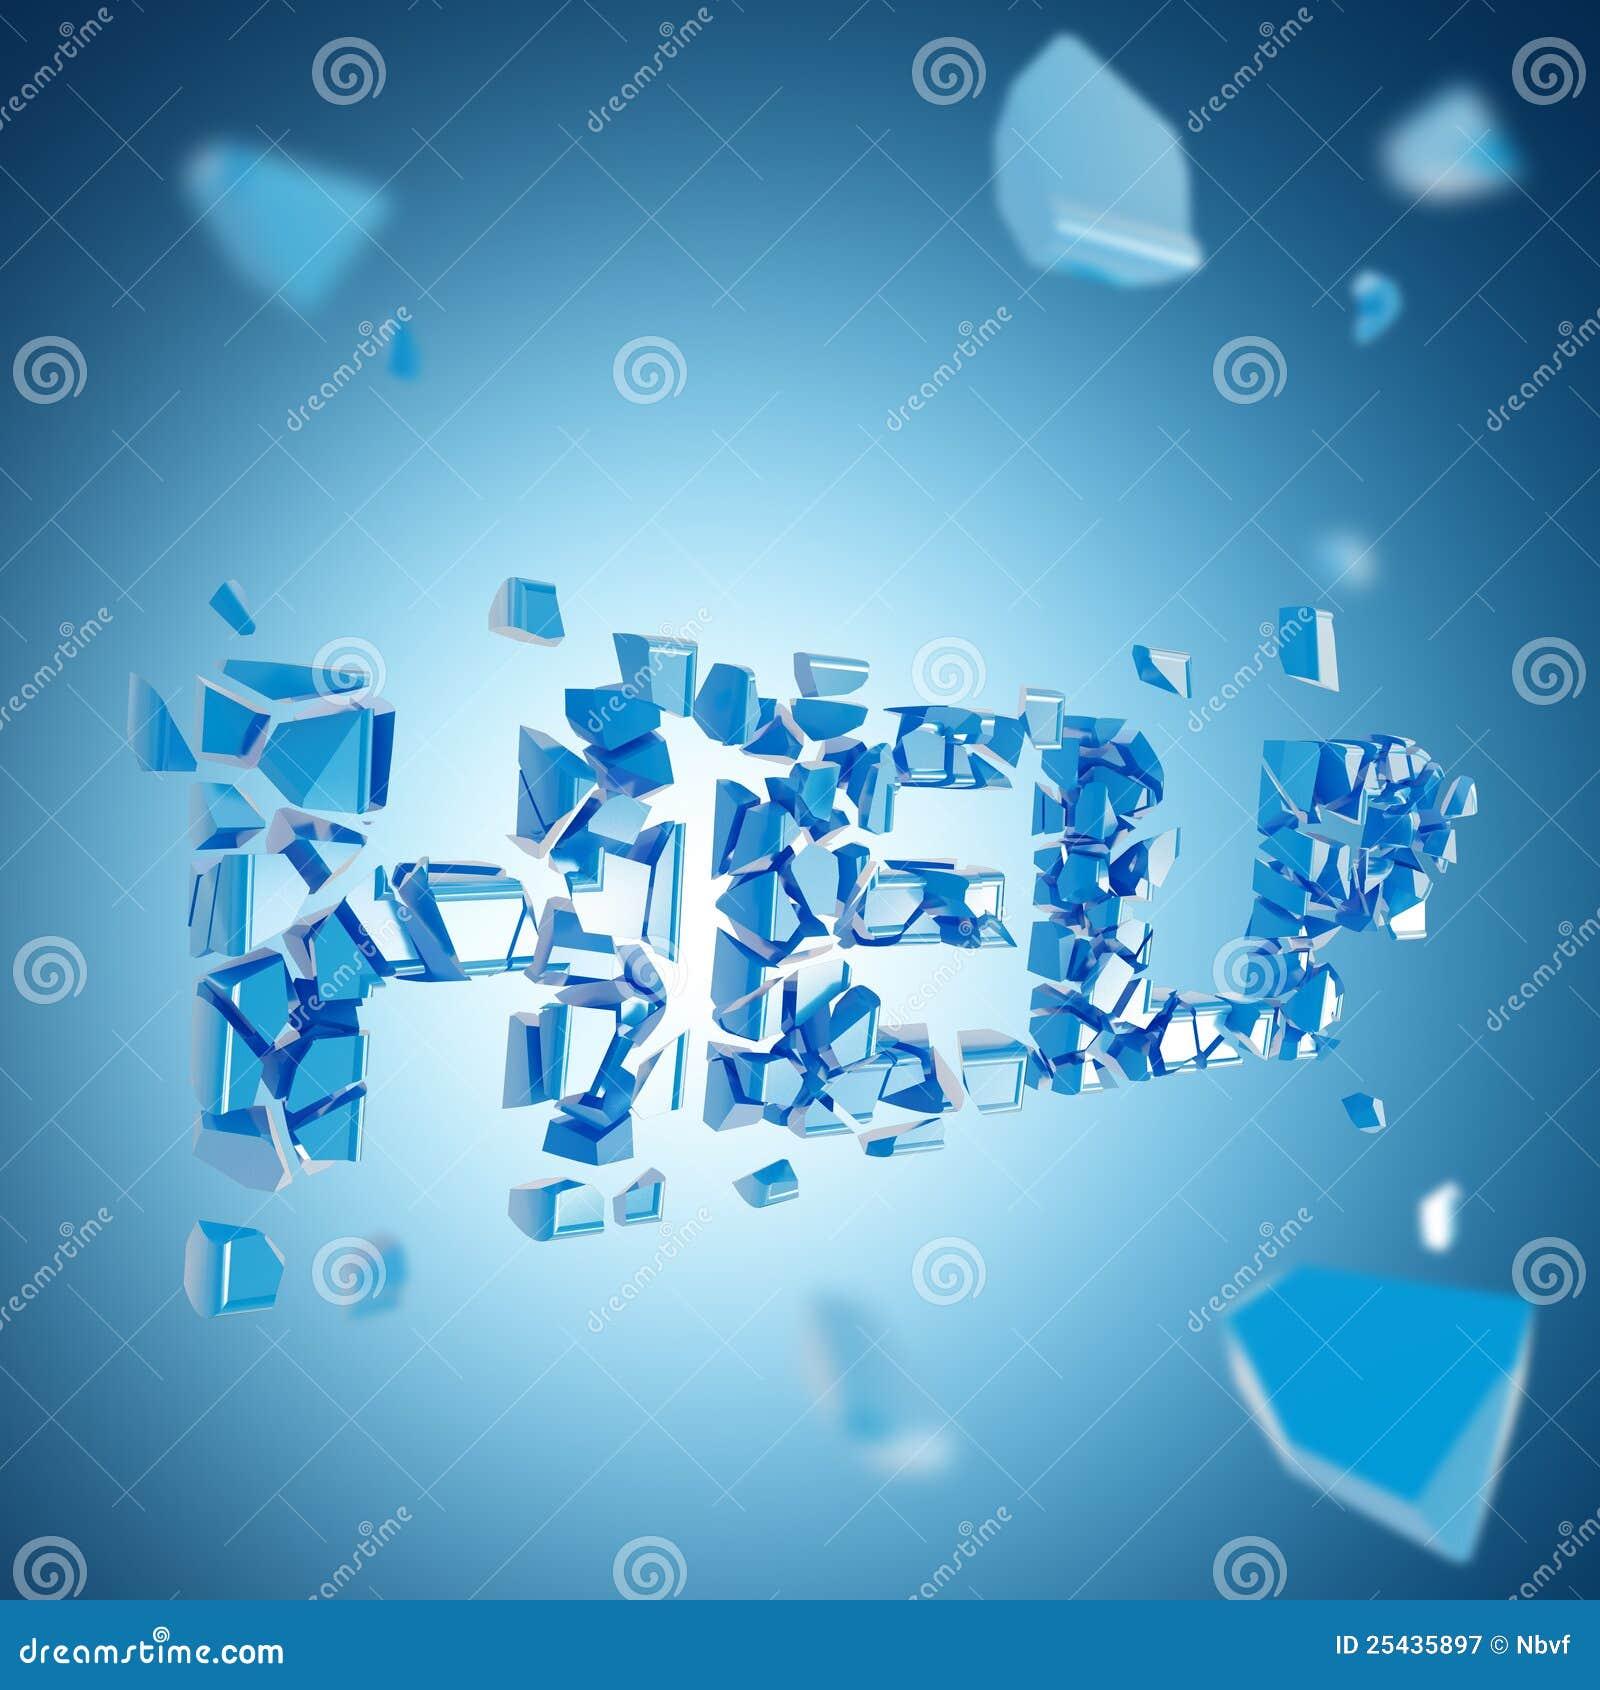 word help broken into pieces background stock illustration